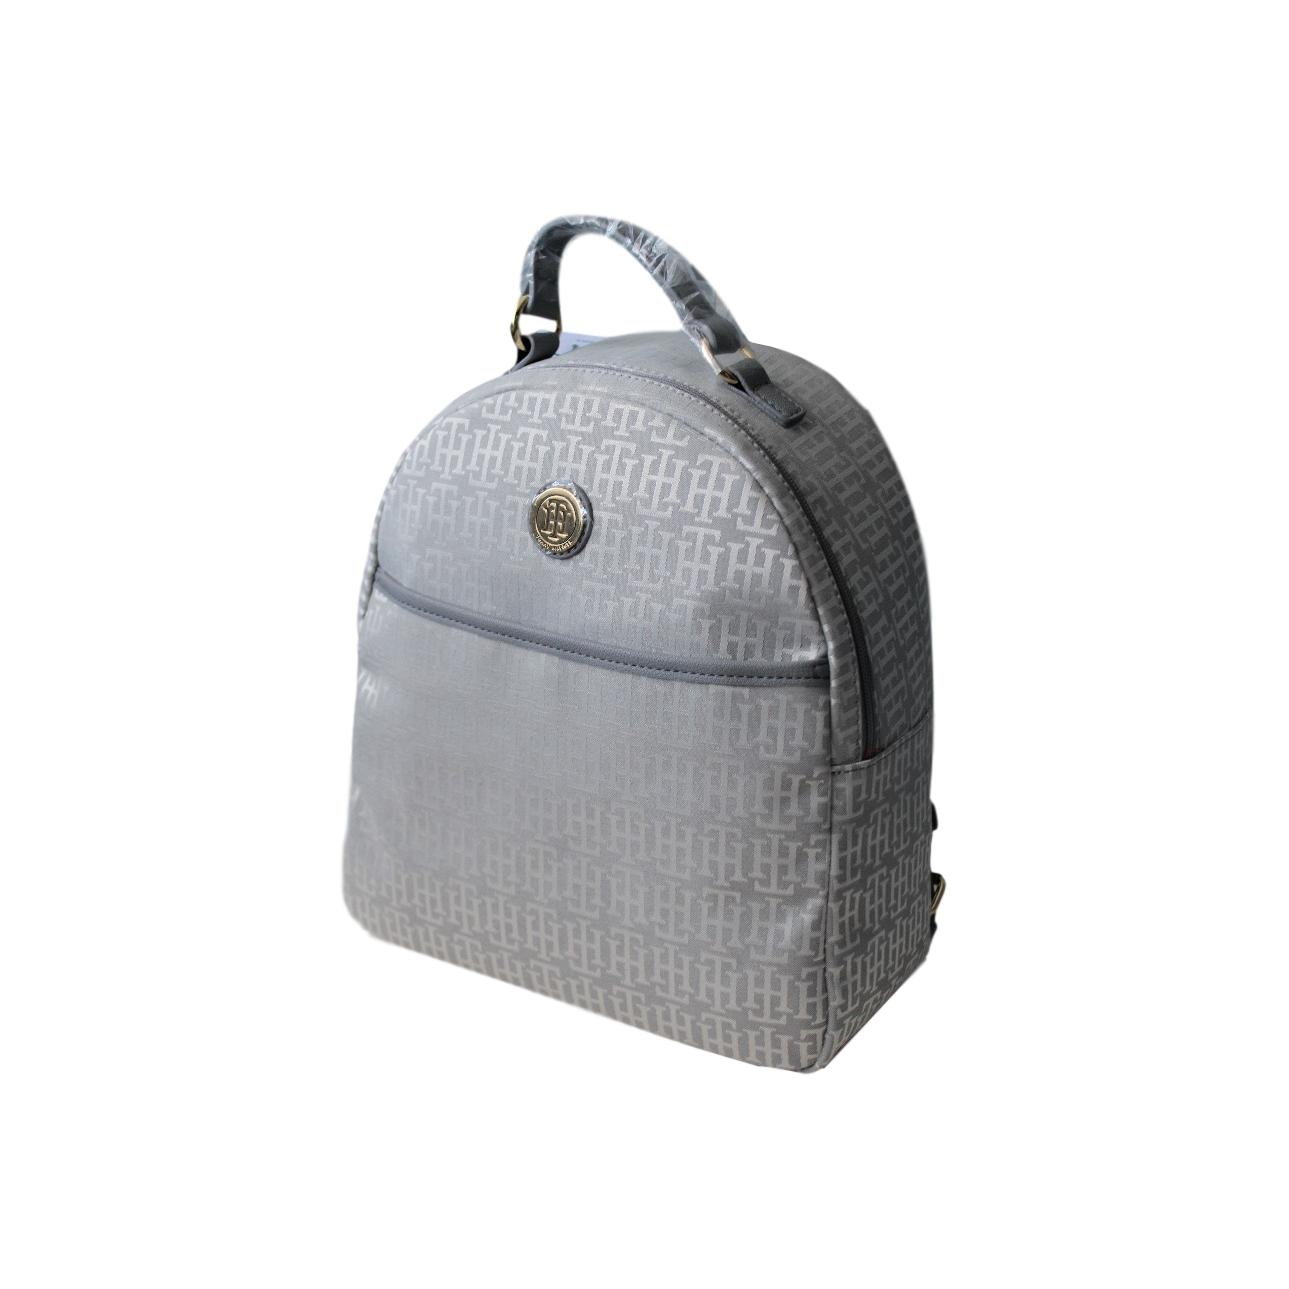 cc3e5816b219 Купить рюкзак Tommy Hilfiger за 7460 руб. в интернет магазине ...